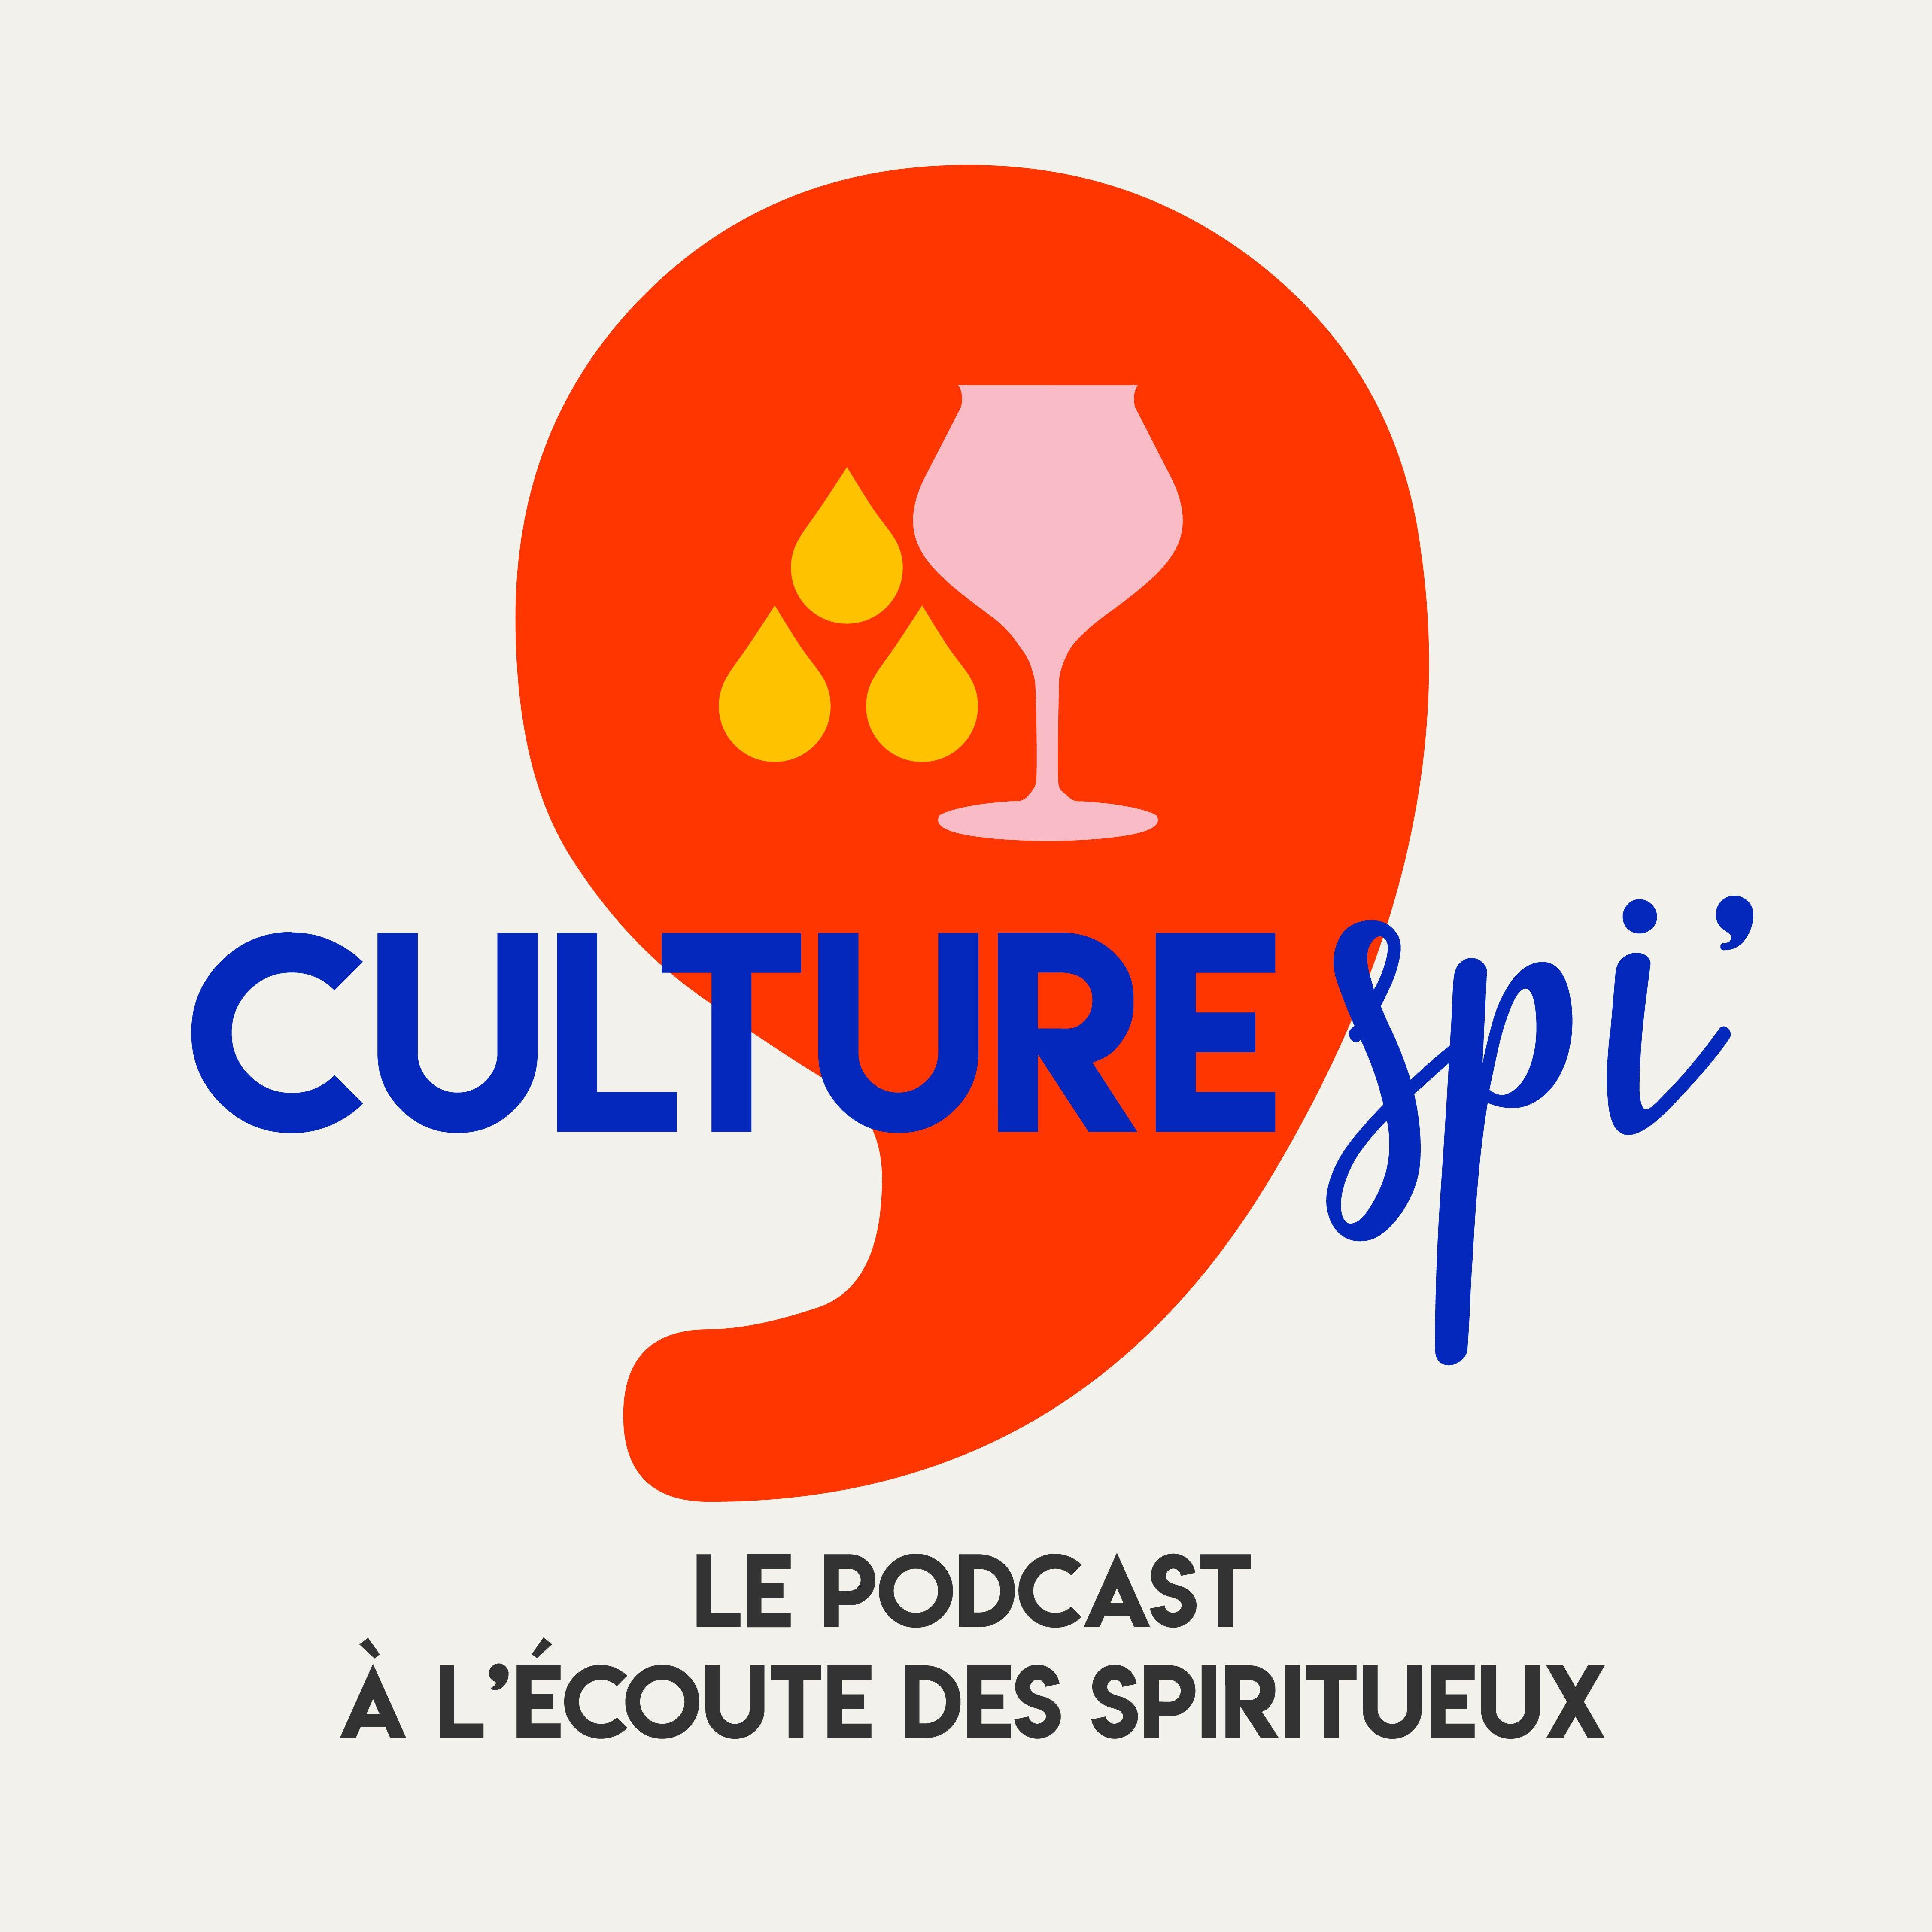 podcast culture spi logo